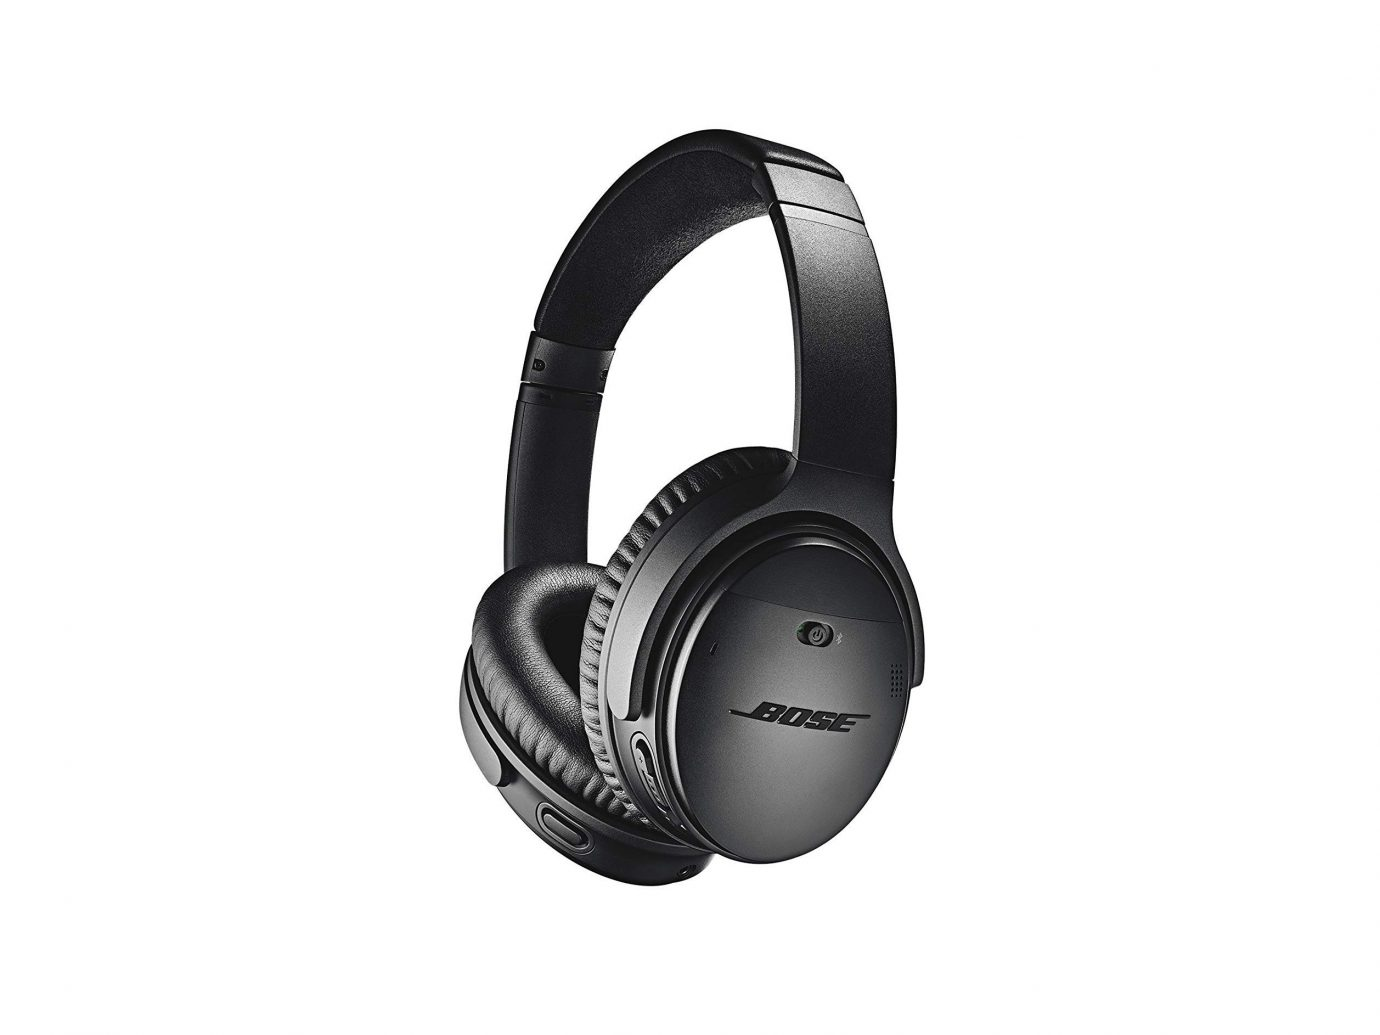 Bose QuietComfort 35 II Wireless Noise-Cancelling Headphones